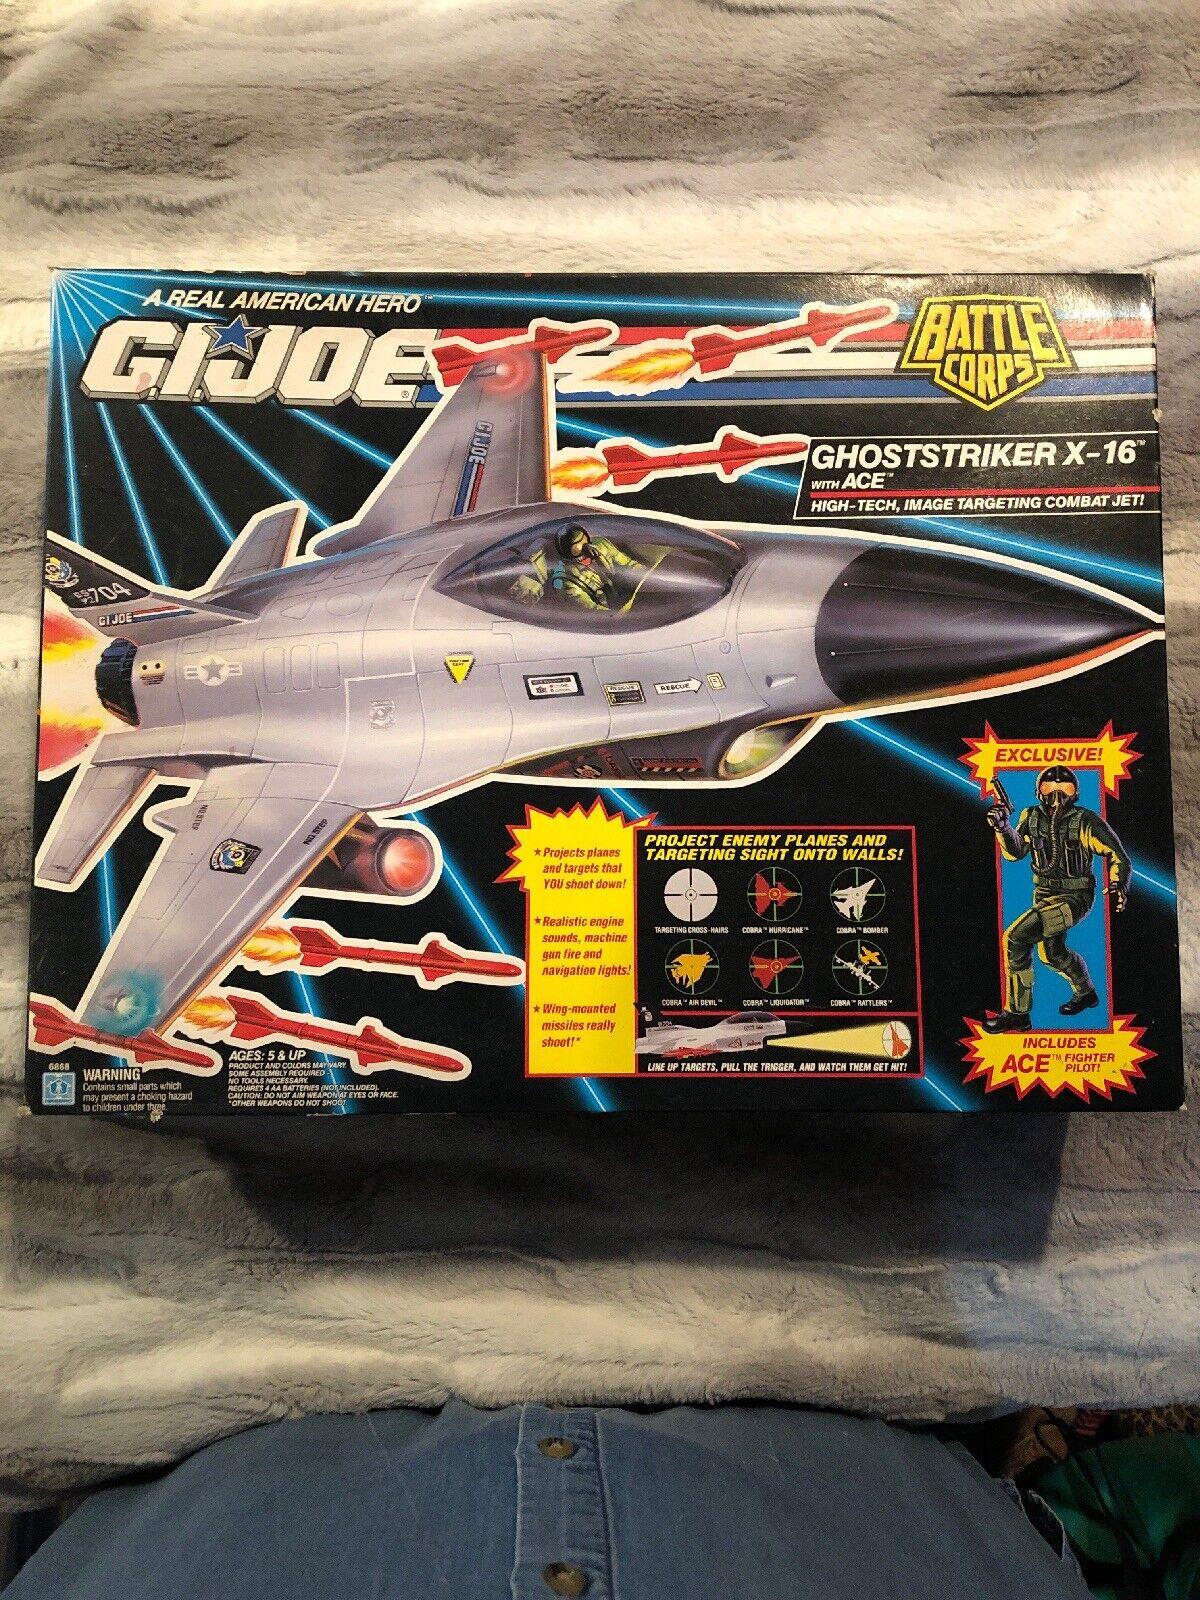 G.I. JOE GHOSTSTRIKER X-16  Battle Corps,with Ace Pilot New Sealed HTF